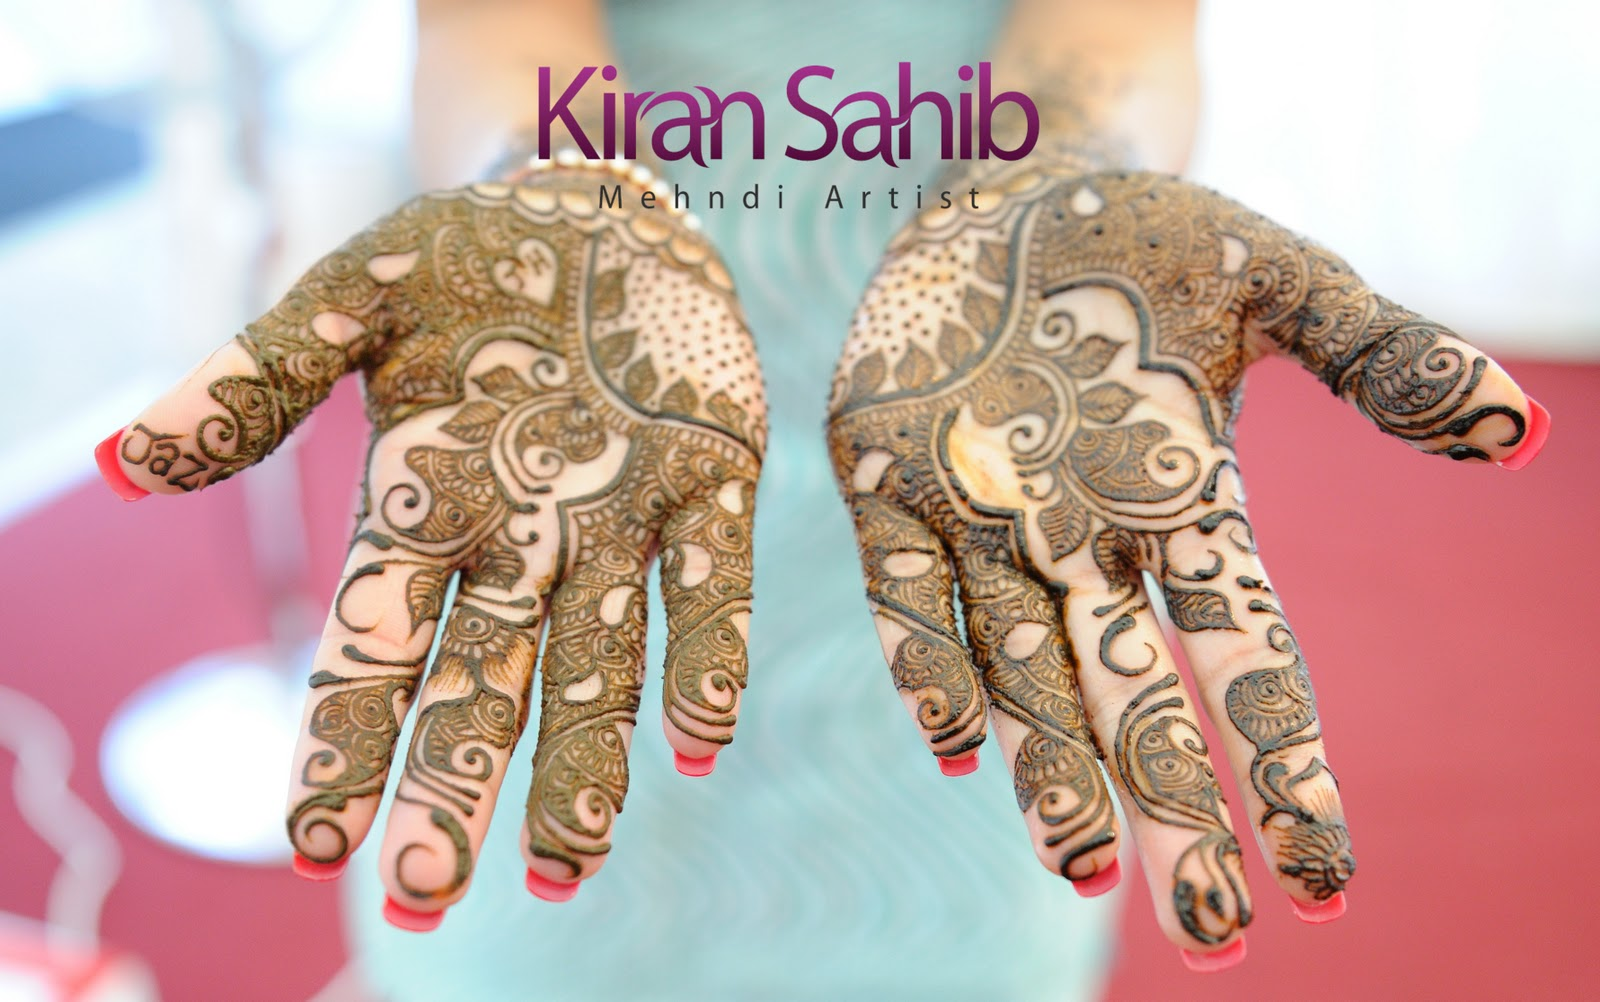 Bridal Mehndi West London : Kiran sahib mehndi artist